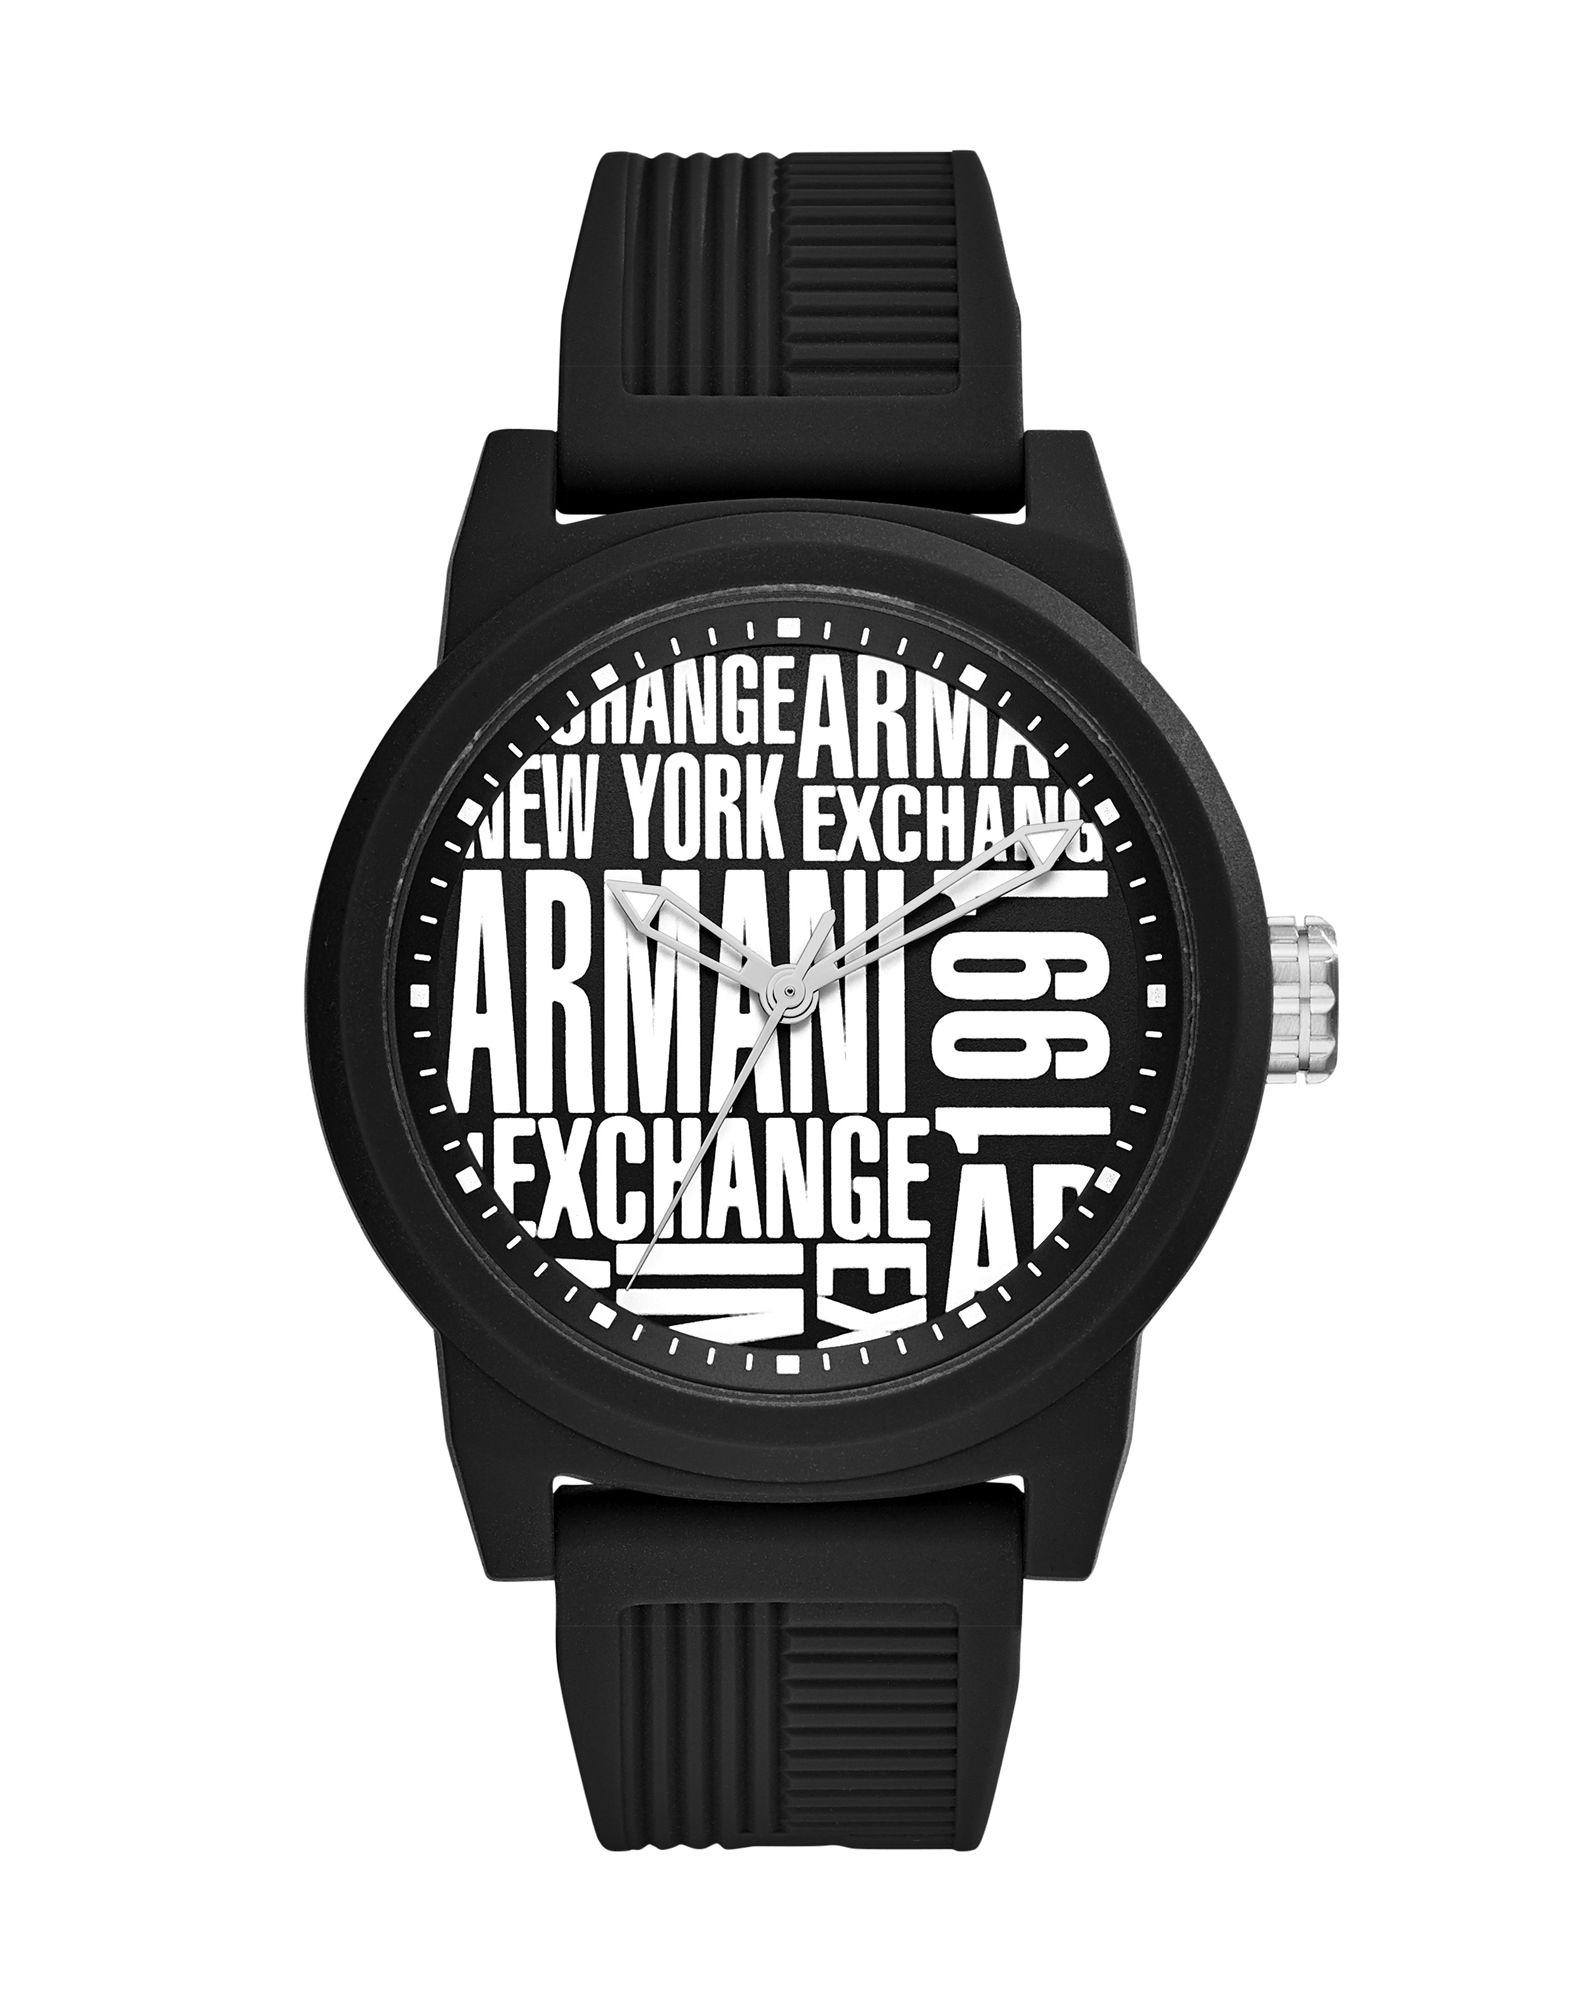 ARMANI EXCHANGE メンズ 腕時計 ブラック シリコン